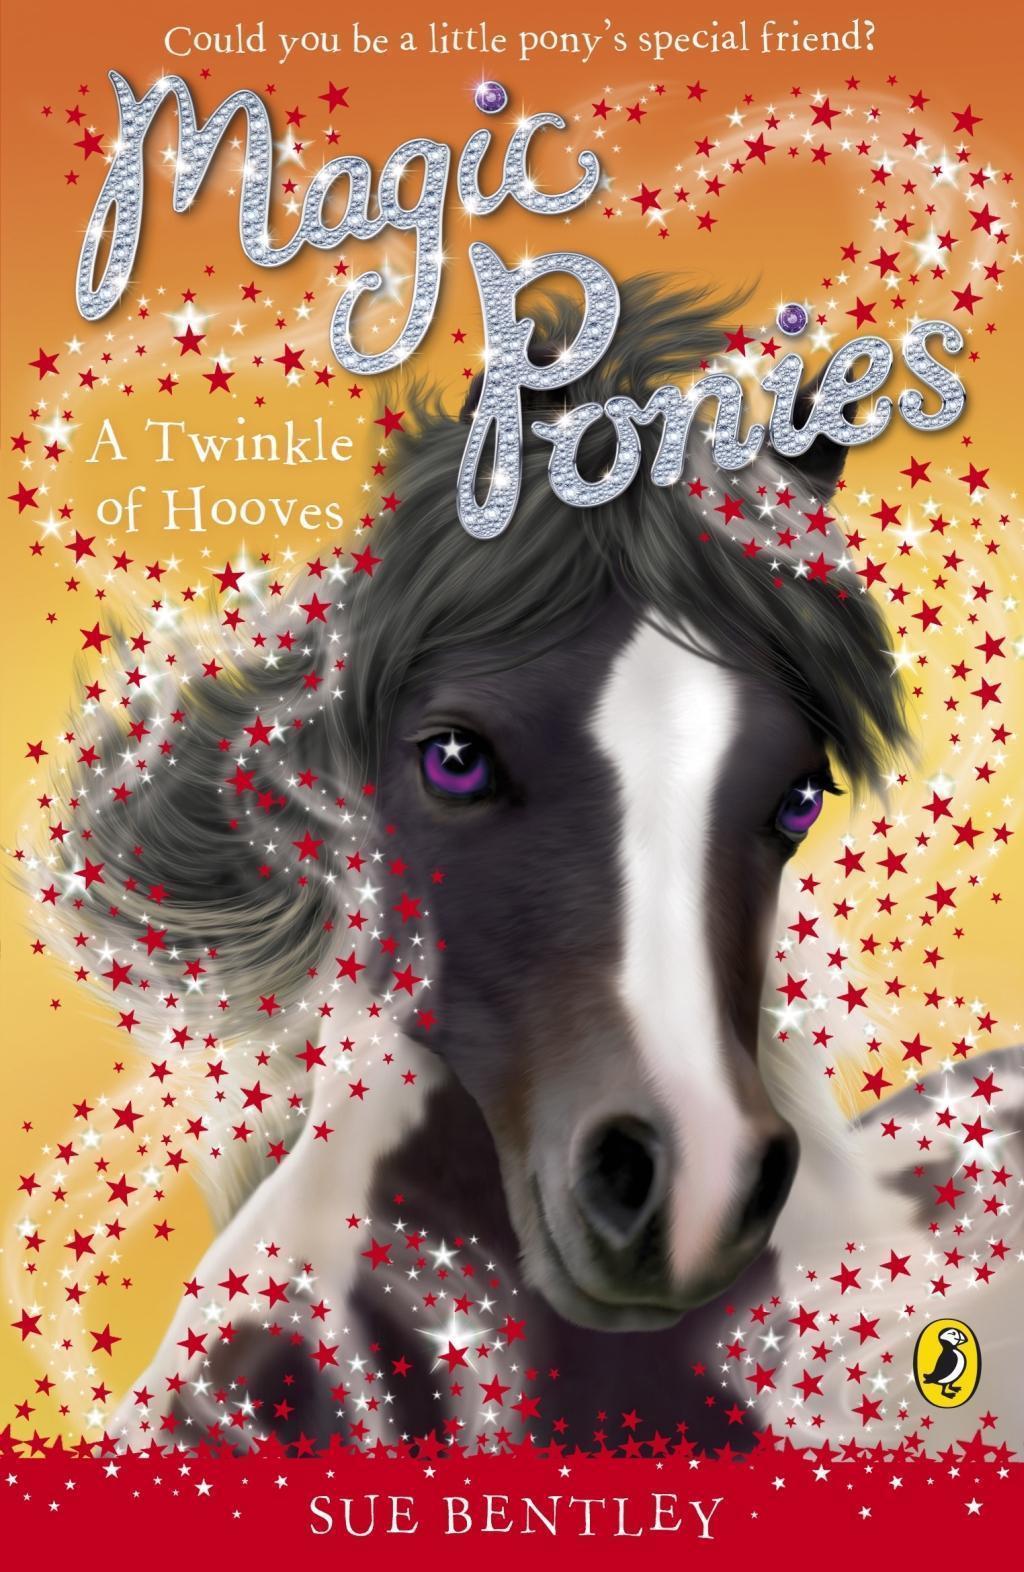 Magic Ponies: A Twinkle of Hooves